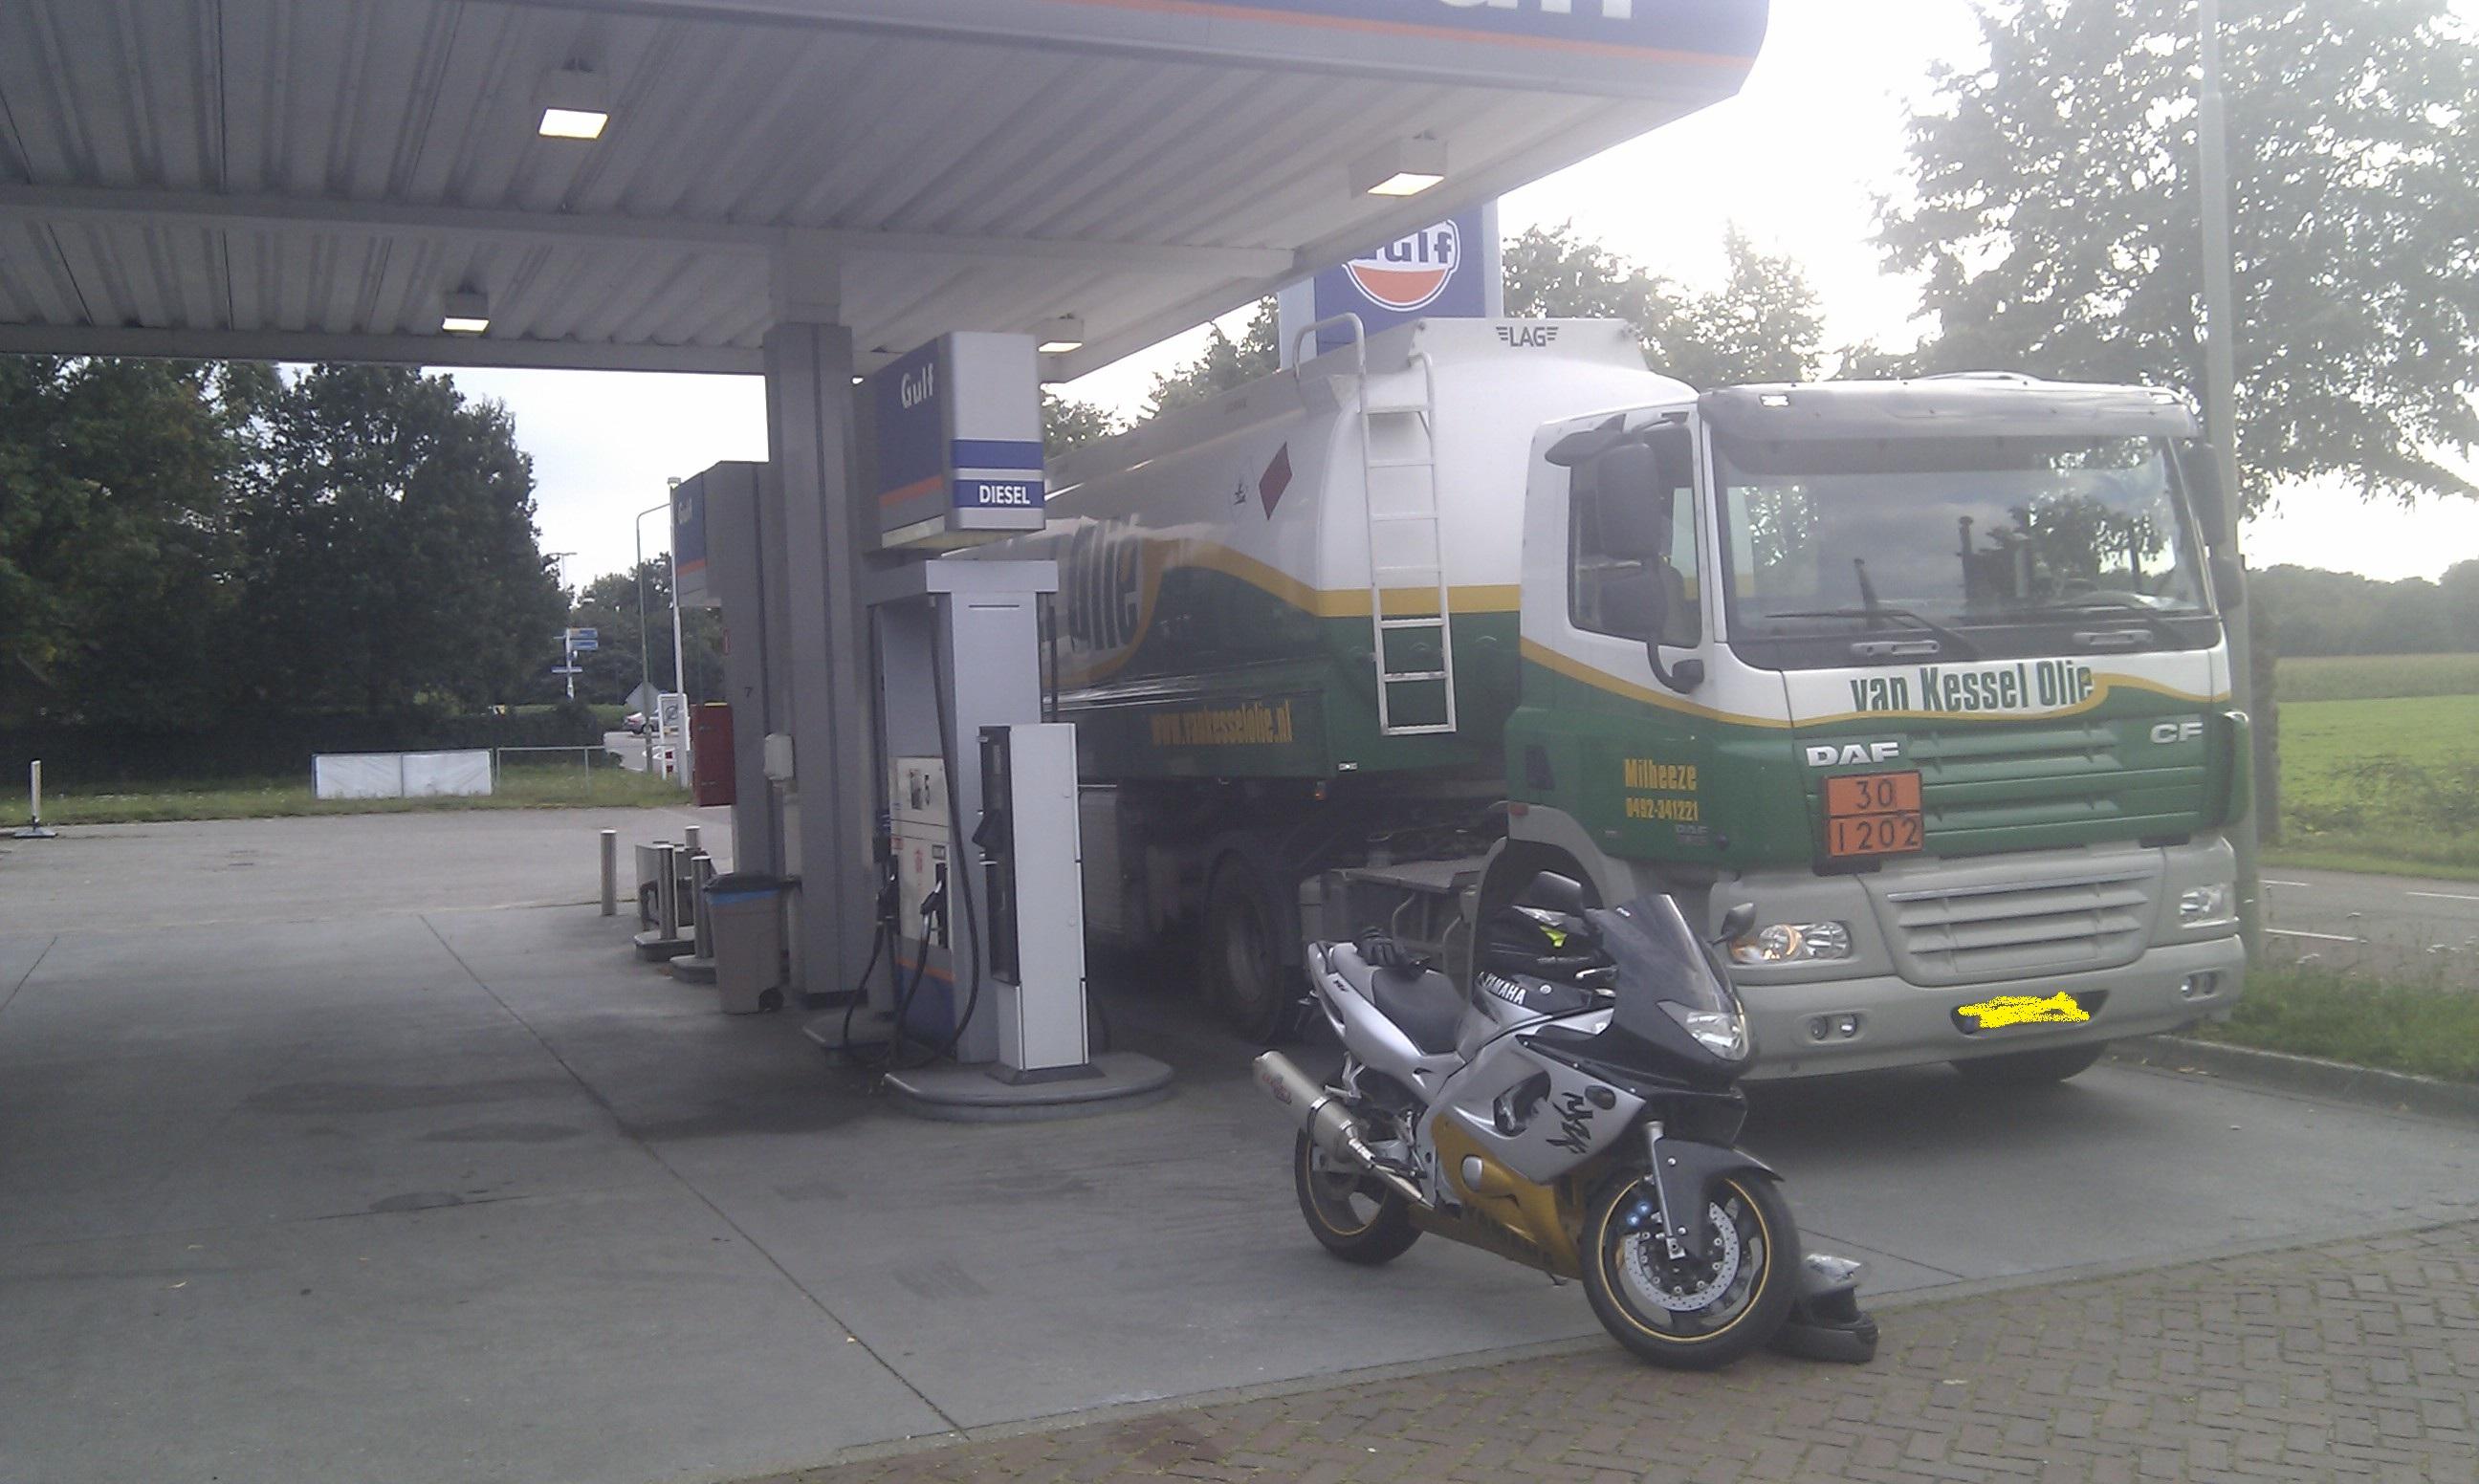 The riding game mf style ss and the rest 6 algemene motorpraat motor forum - Tuinmeubilair op een helling ...